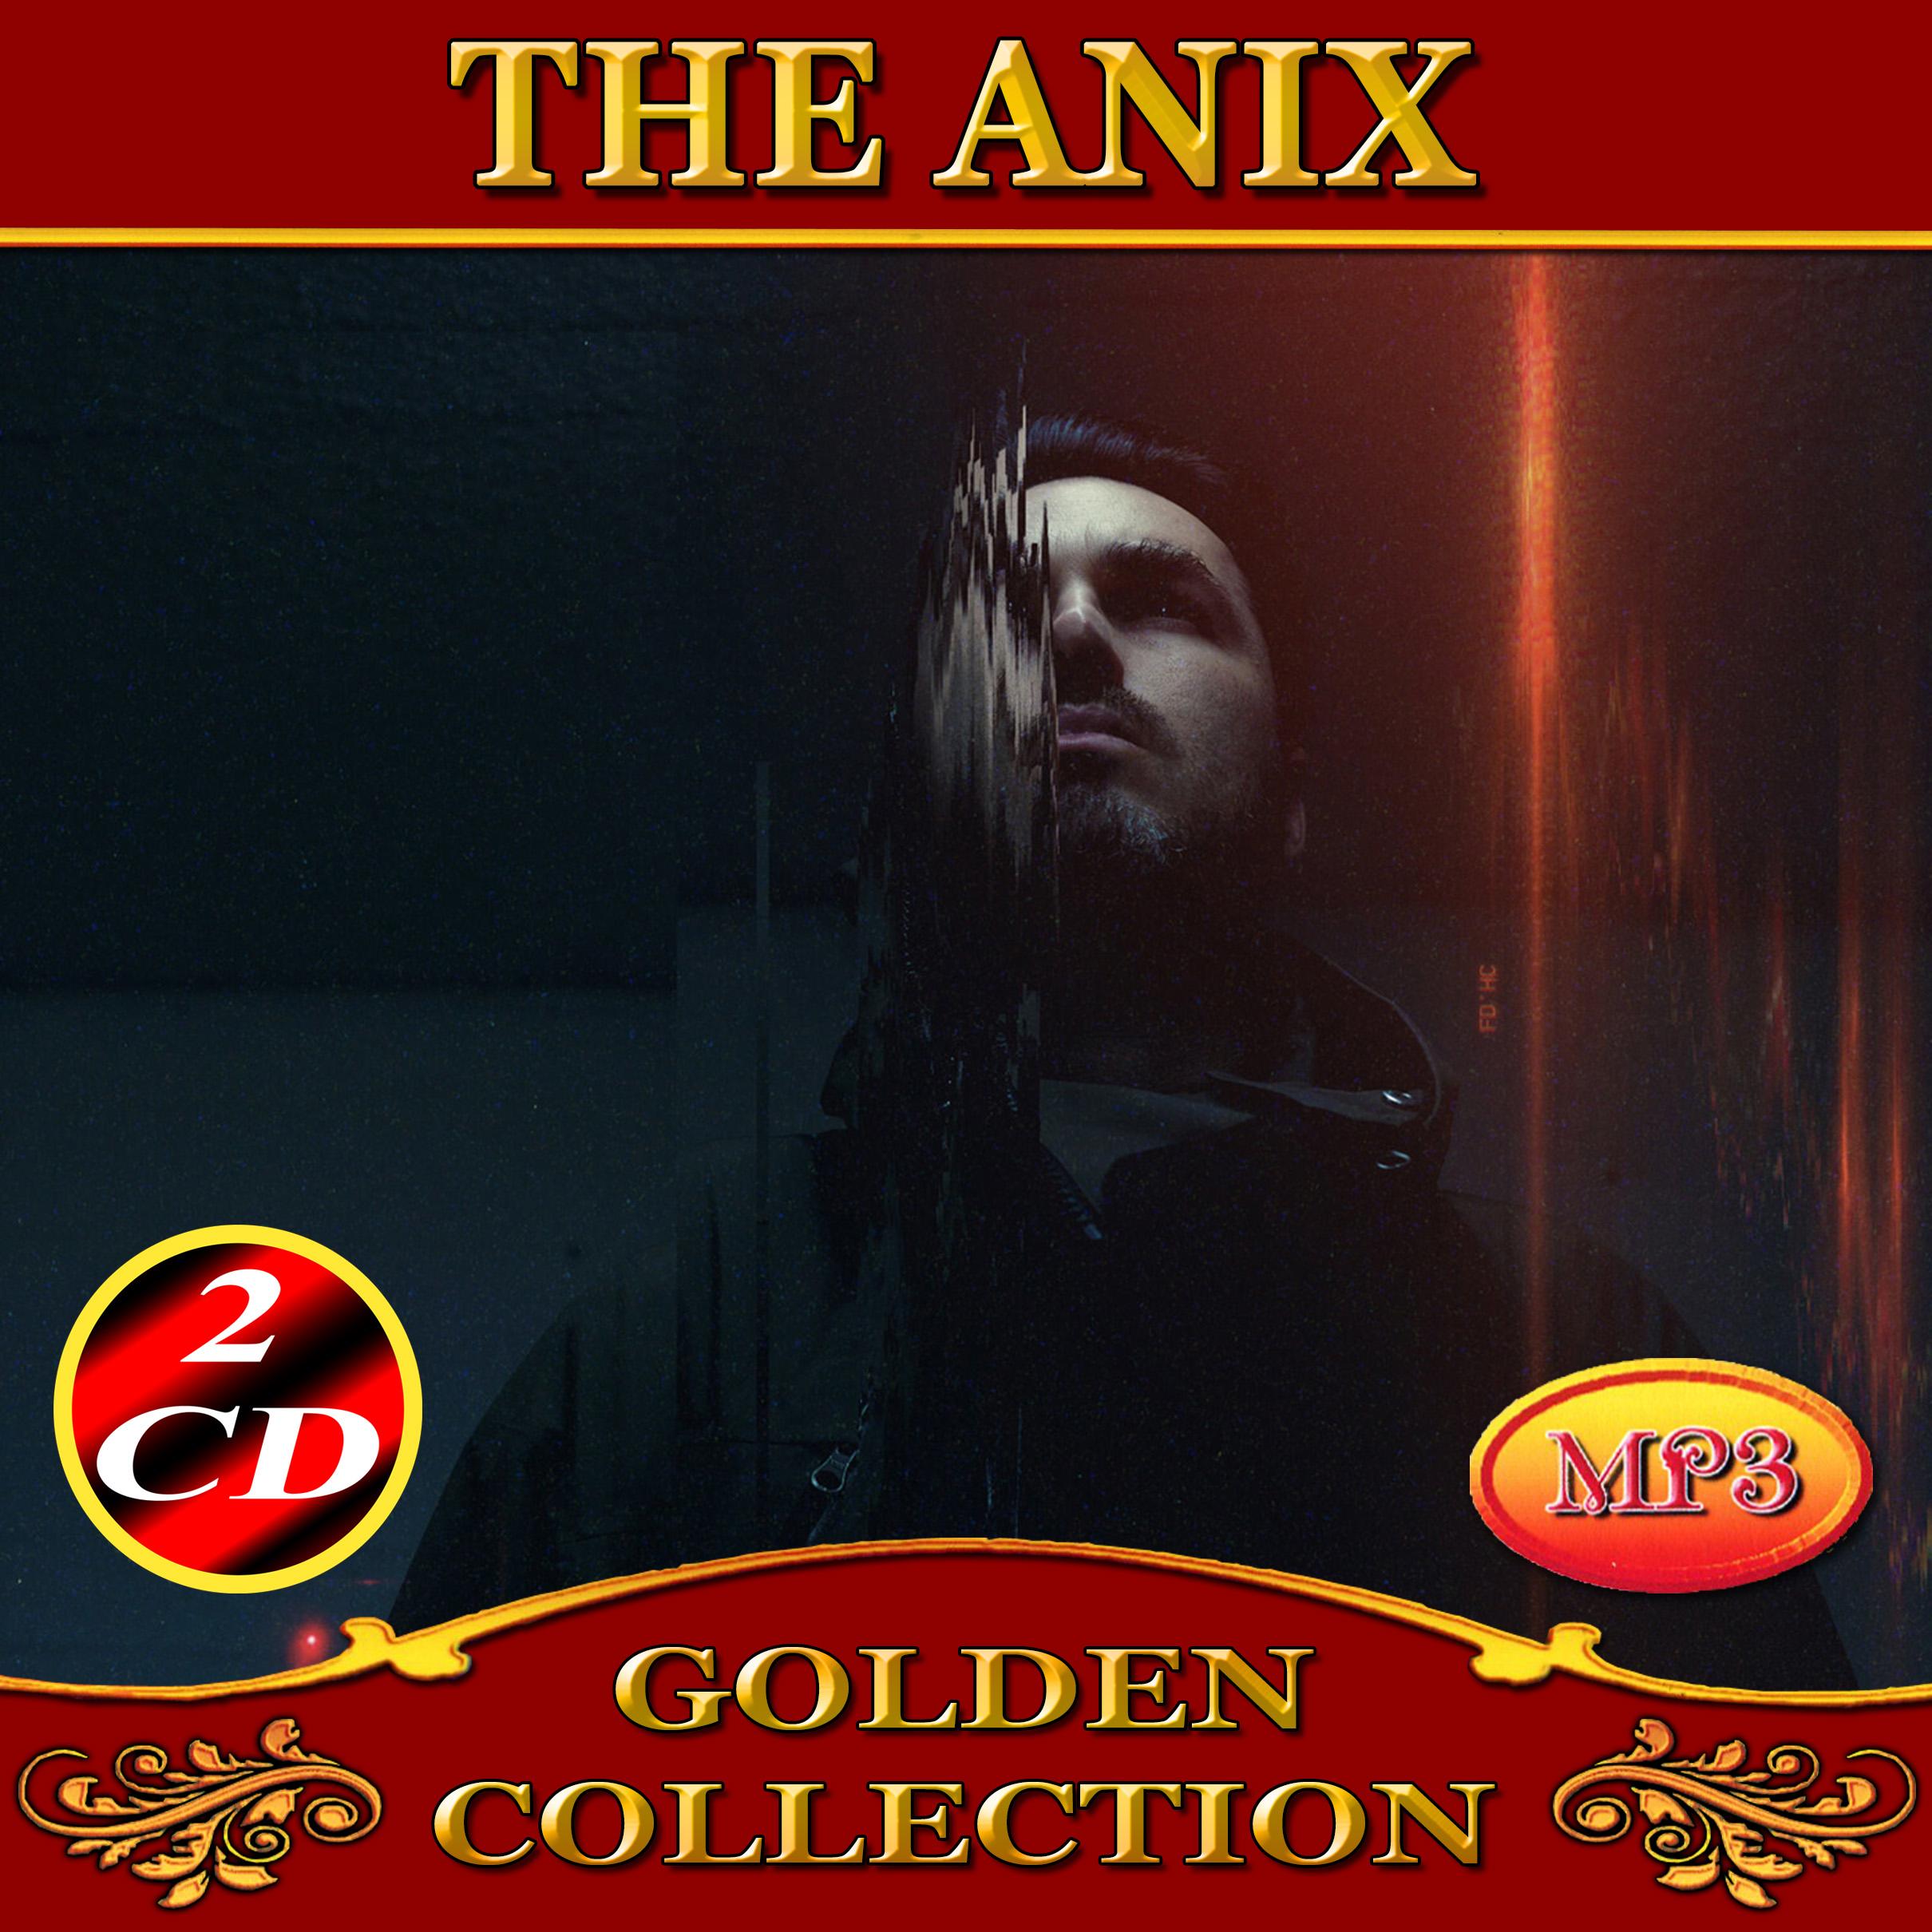 The Anix 2cd [mp3]